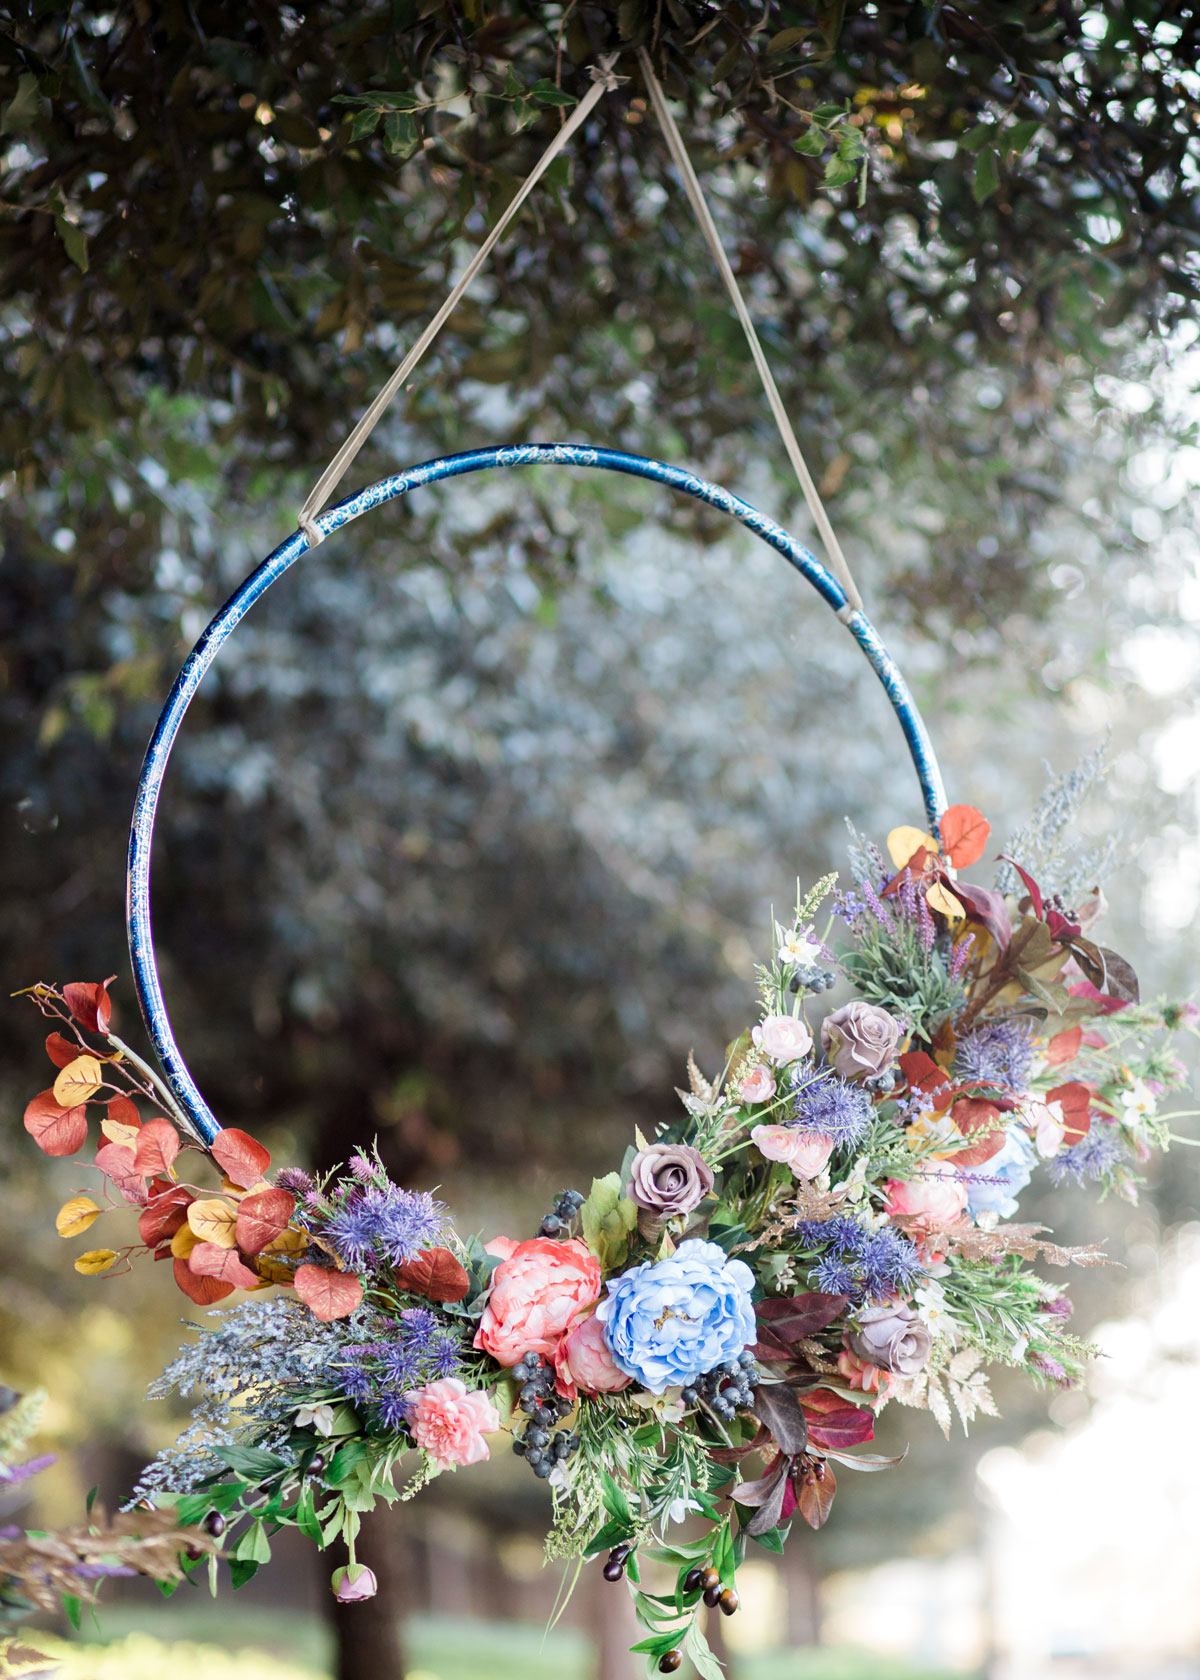 TheFauxBouquets_CassiaOwenPhotography_Wreath_DIY_12-2016_14 2.jpg